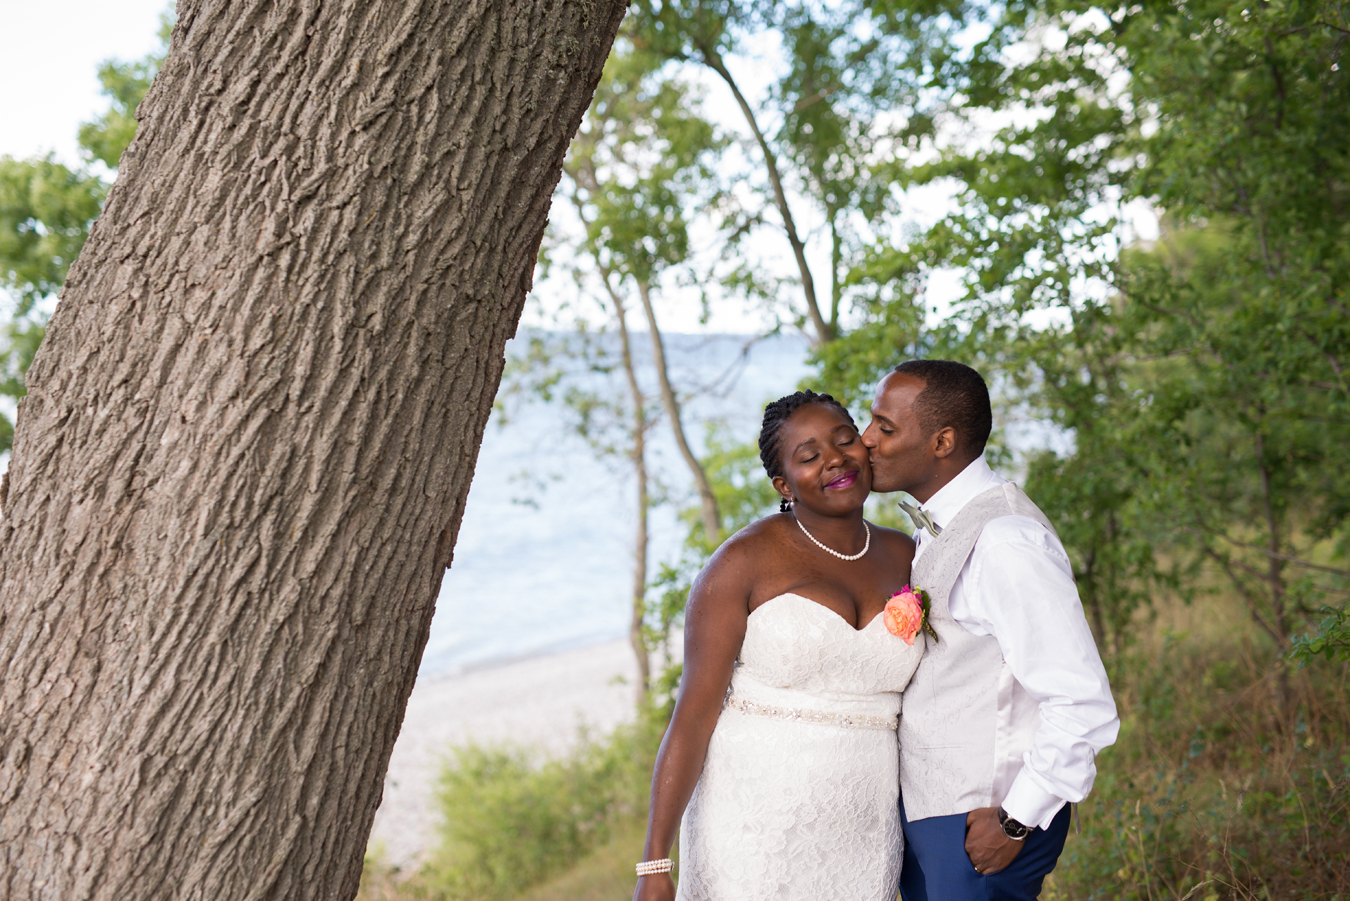 049-bröllop-gotland-fridhem-neas-fotografi.jpg